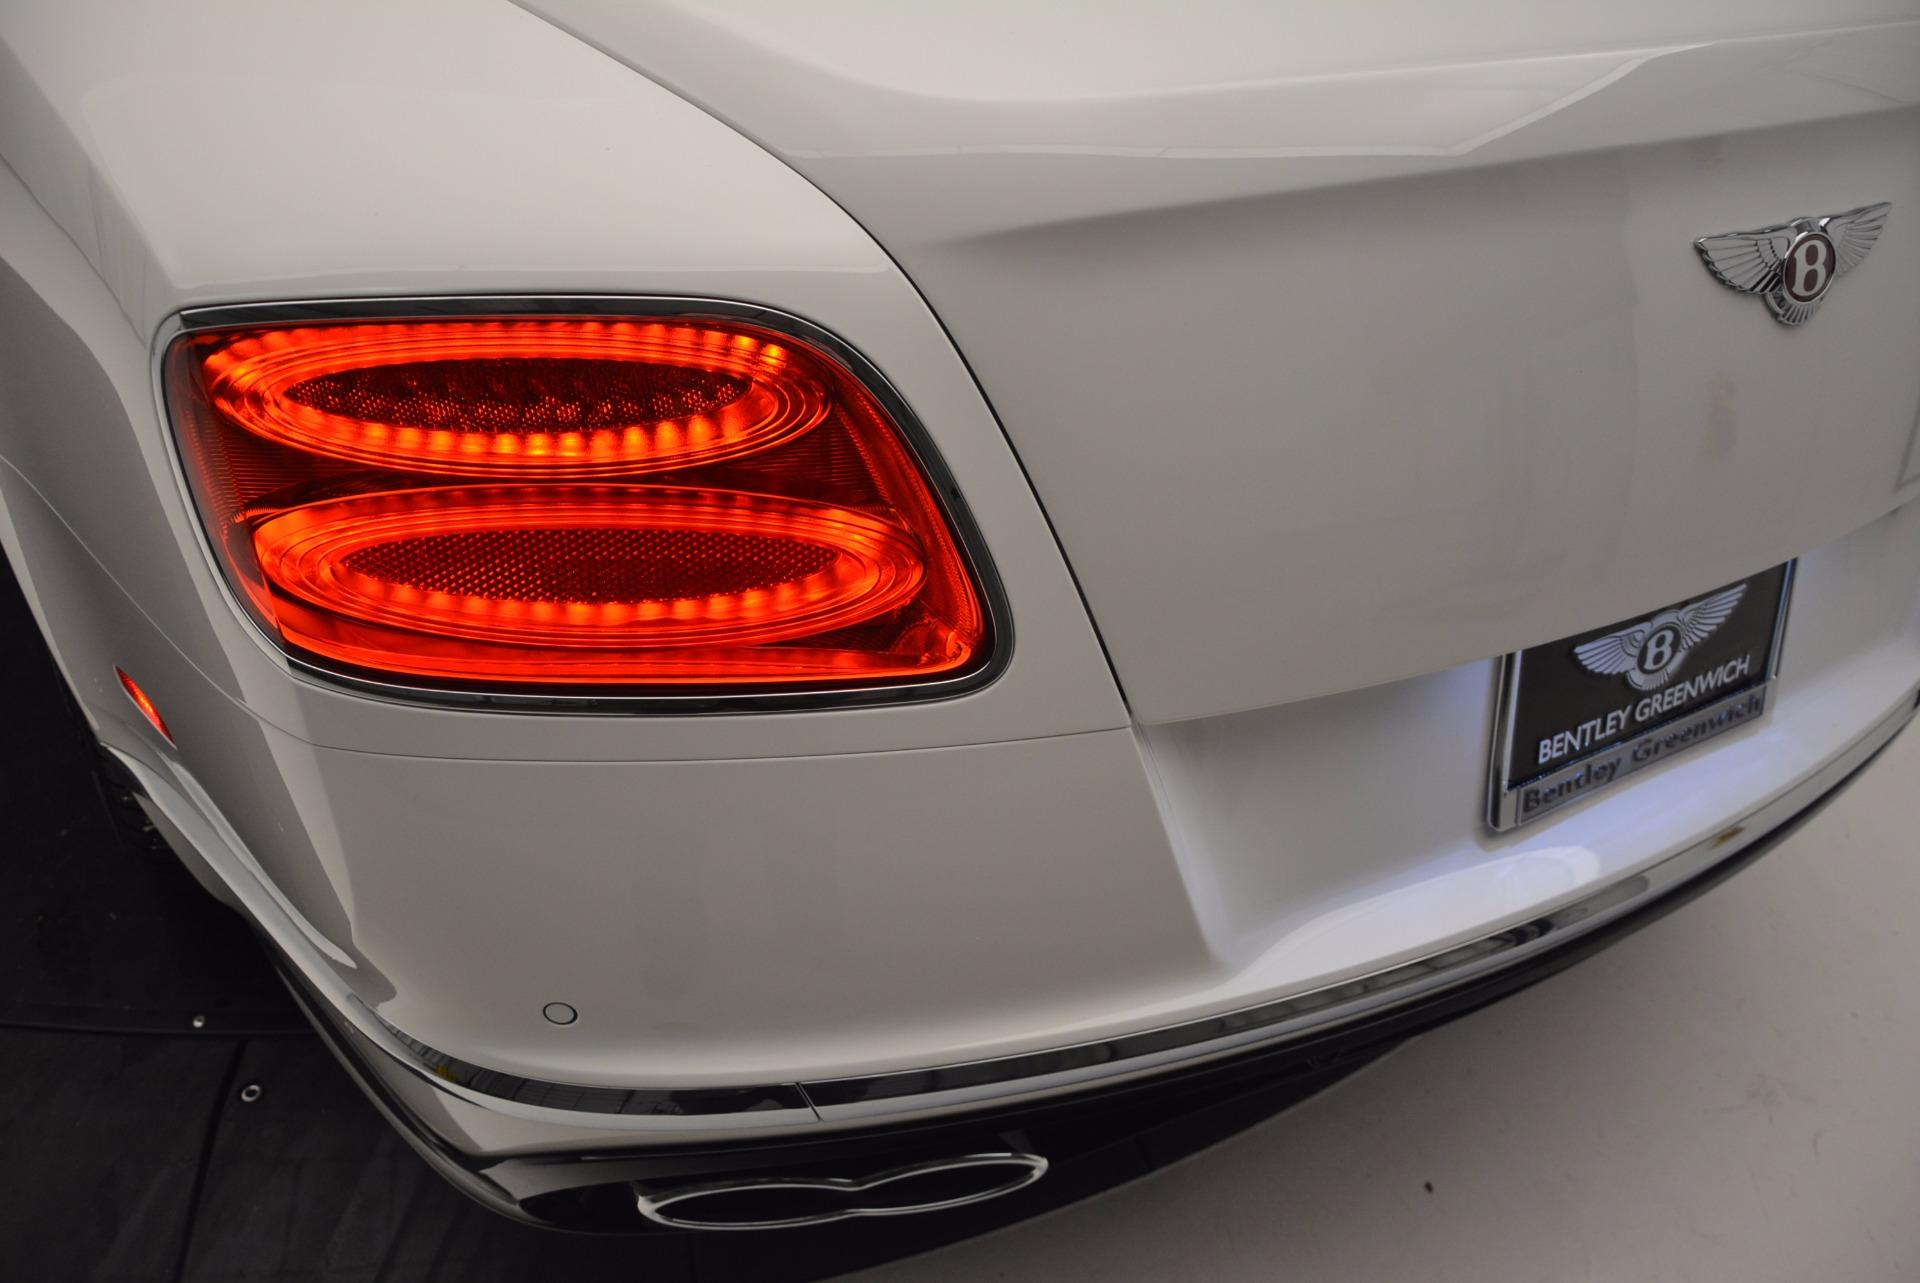 New 2017 Bentley Continental GT V8 S For Sale In Westport, CT 721_p46